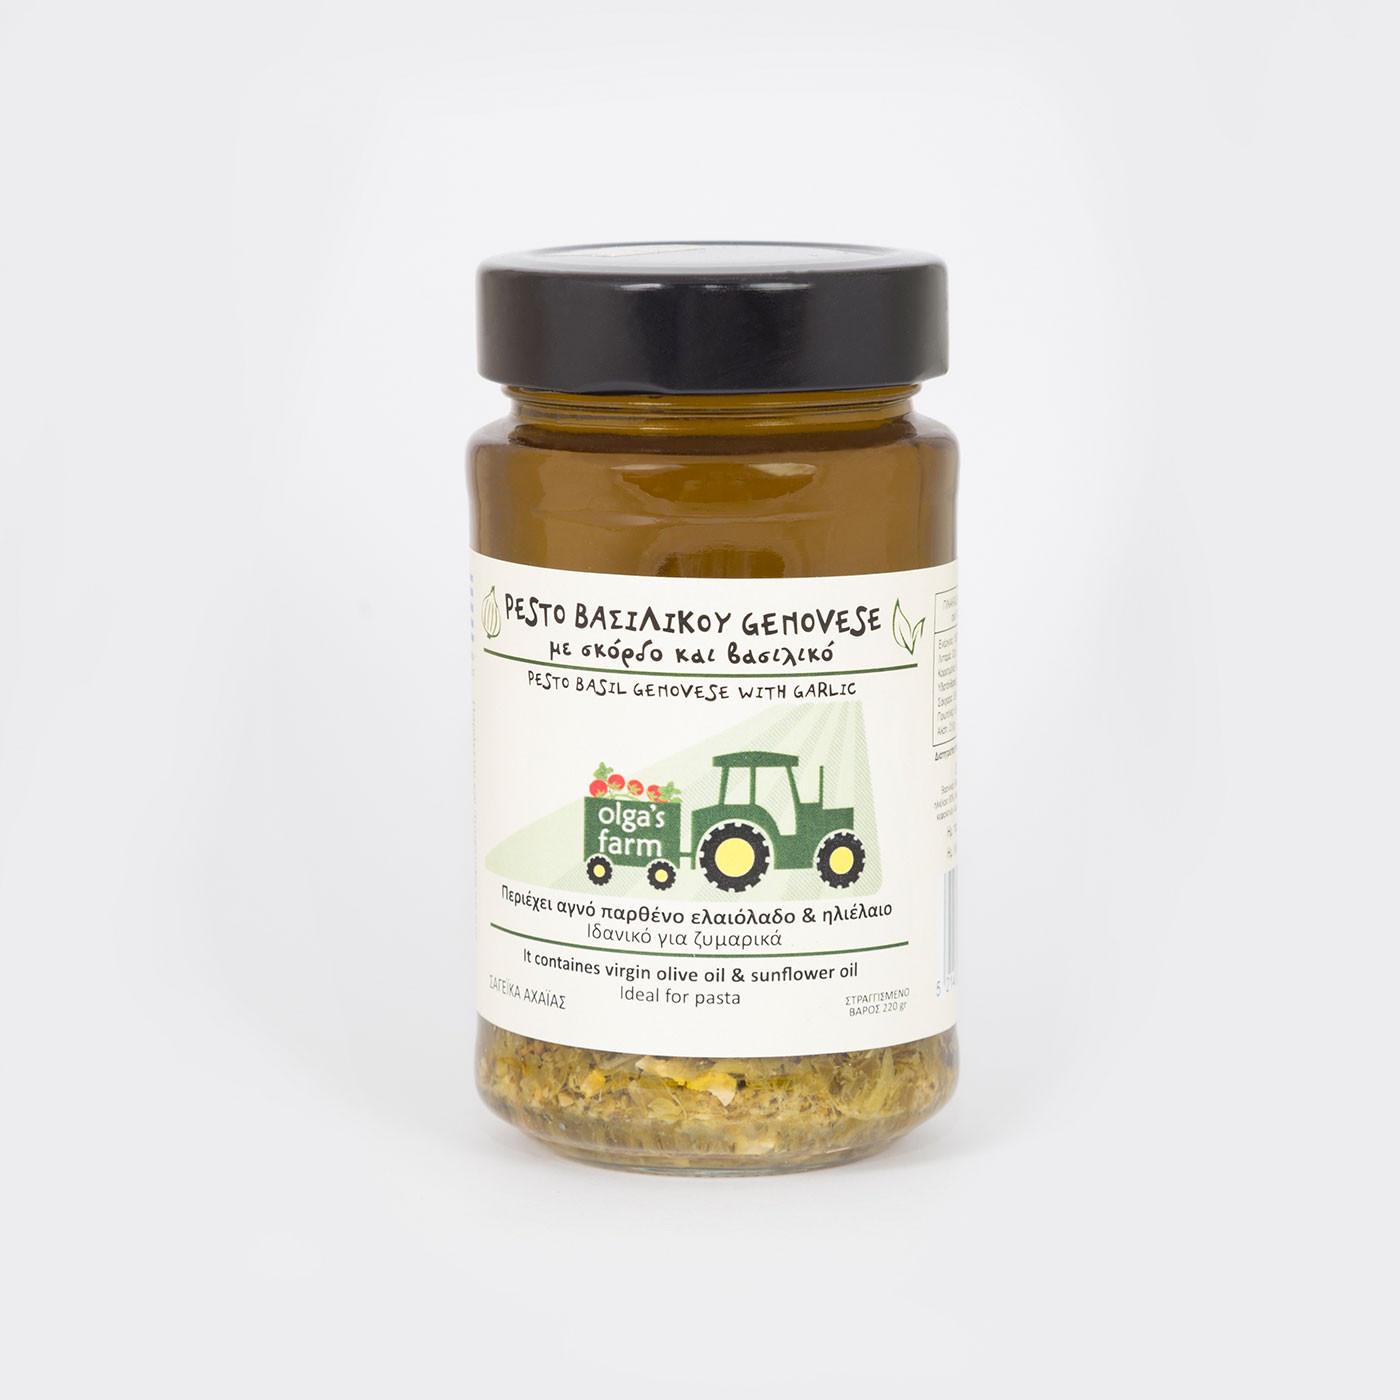 "Pesto Βασιλικού genovese με σκόρδο και βασιλικό ""olga's farm"" 220 g"